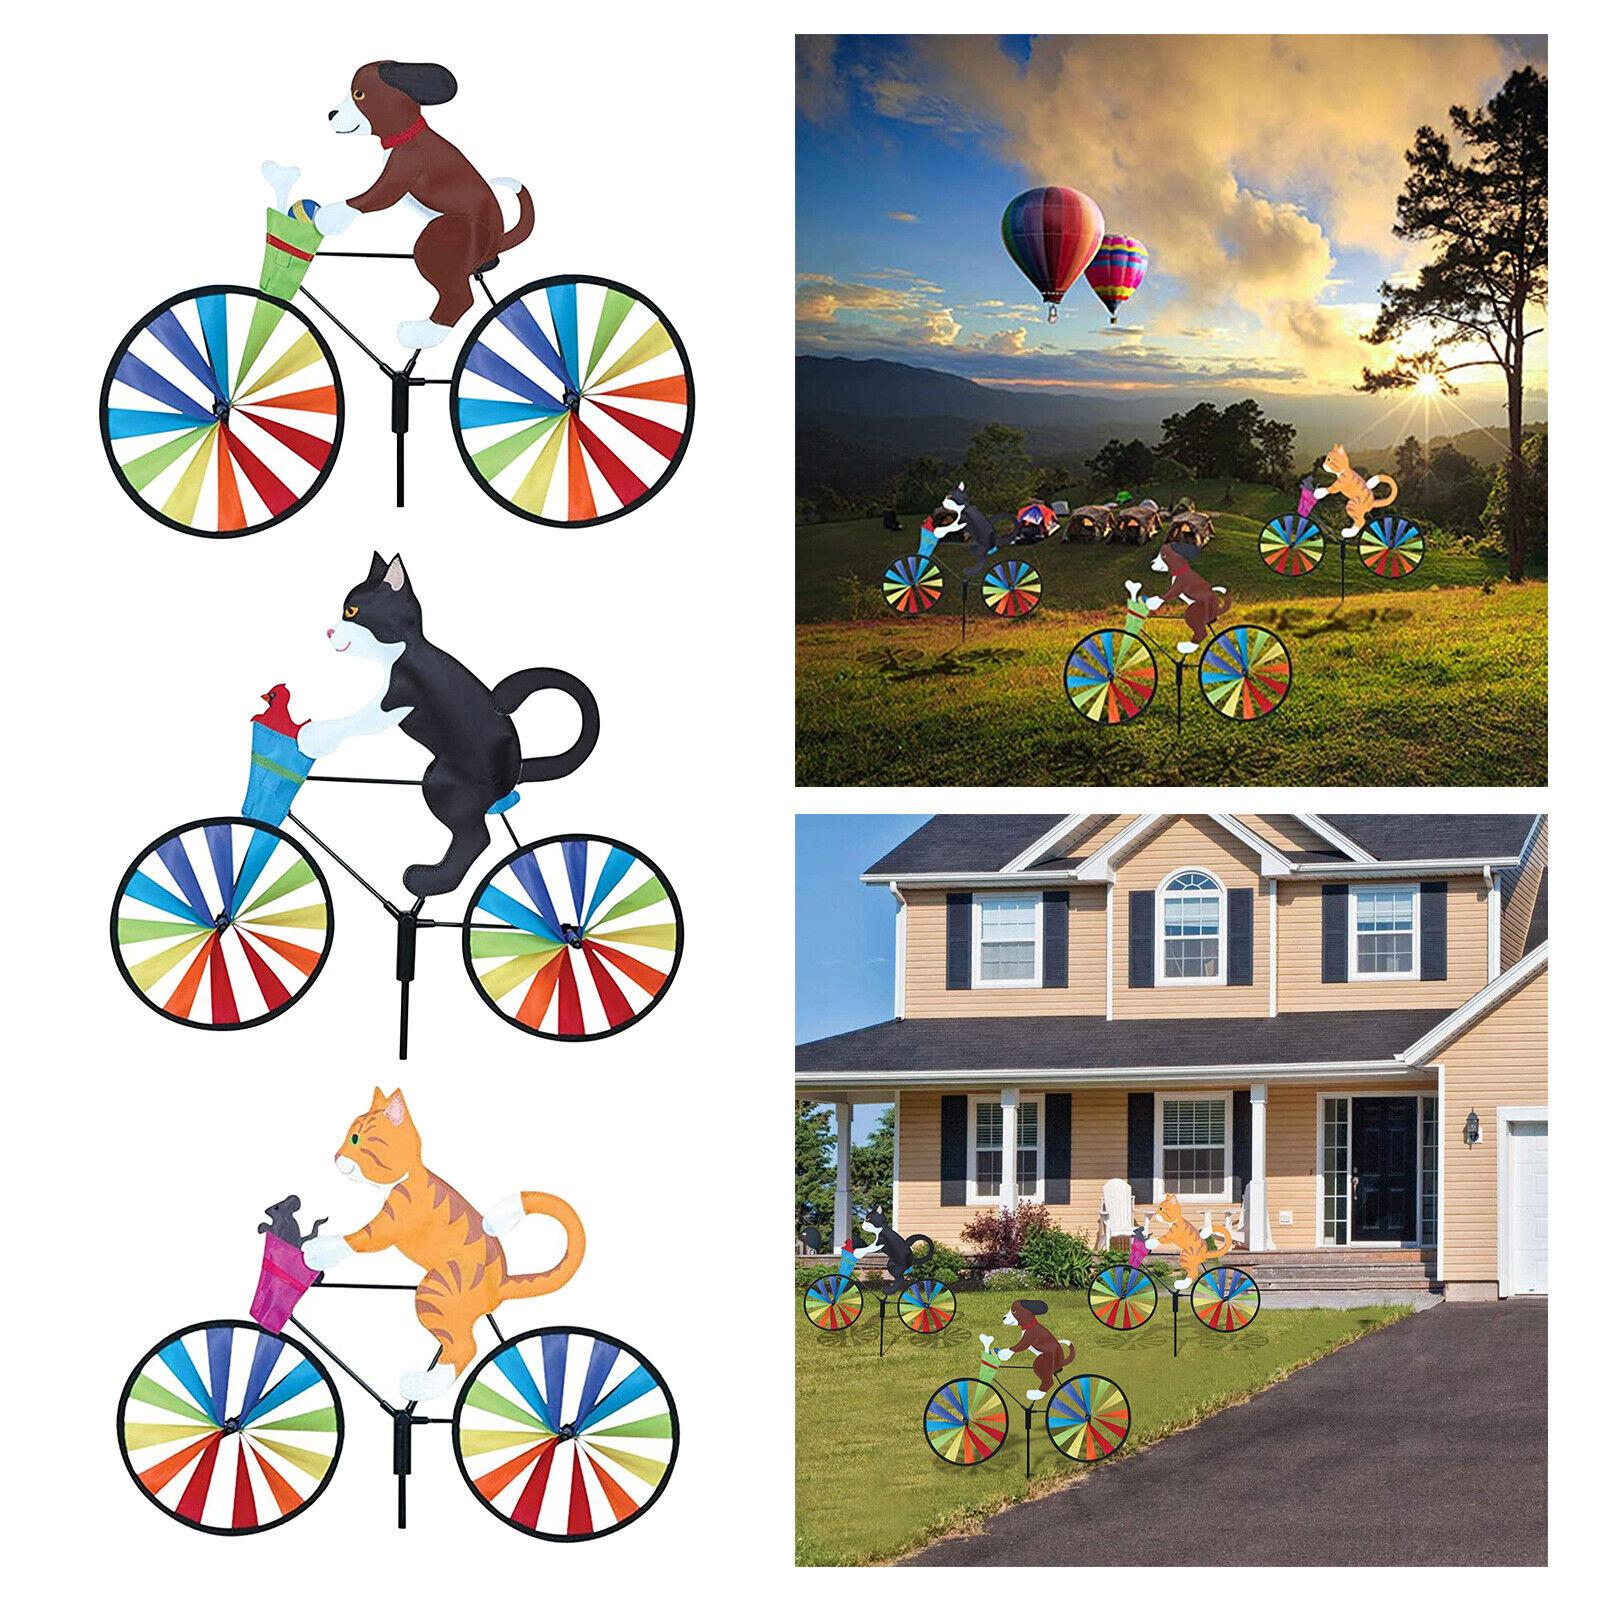 Wheel Rainbow Windmill Wind Spinner Whirligig Garden Home Lawn Yard Decor